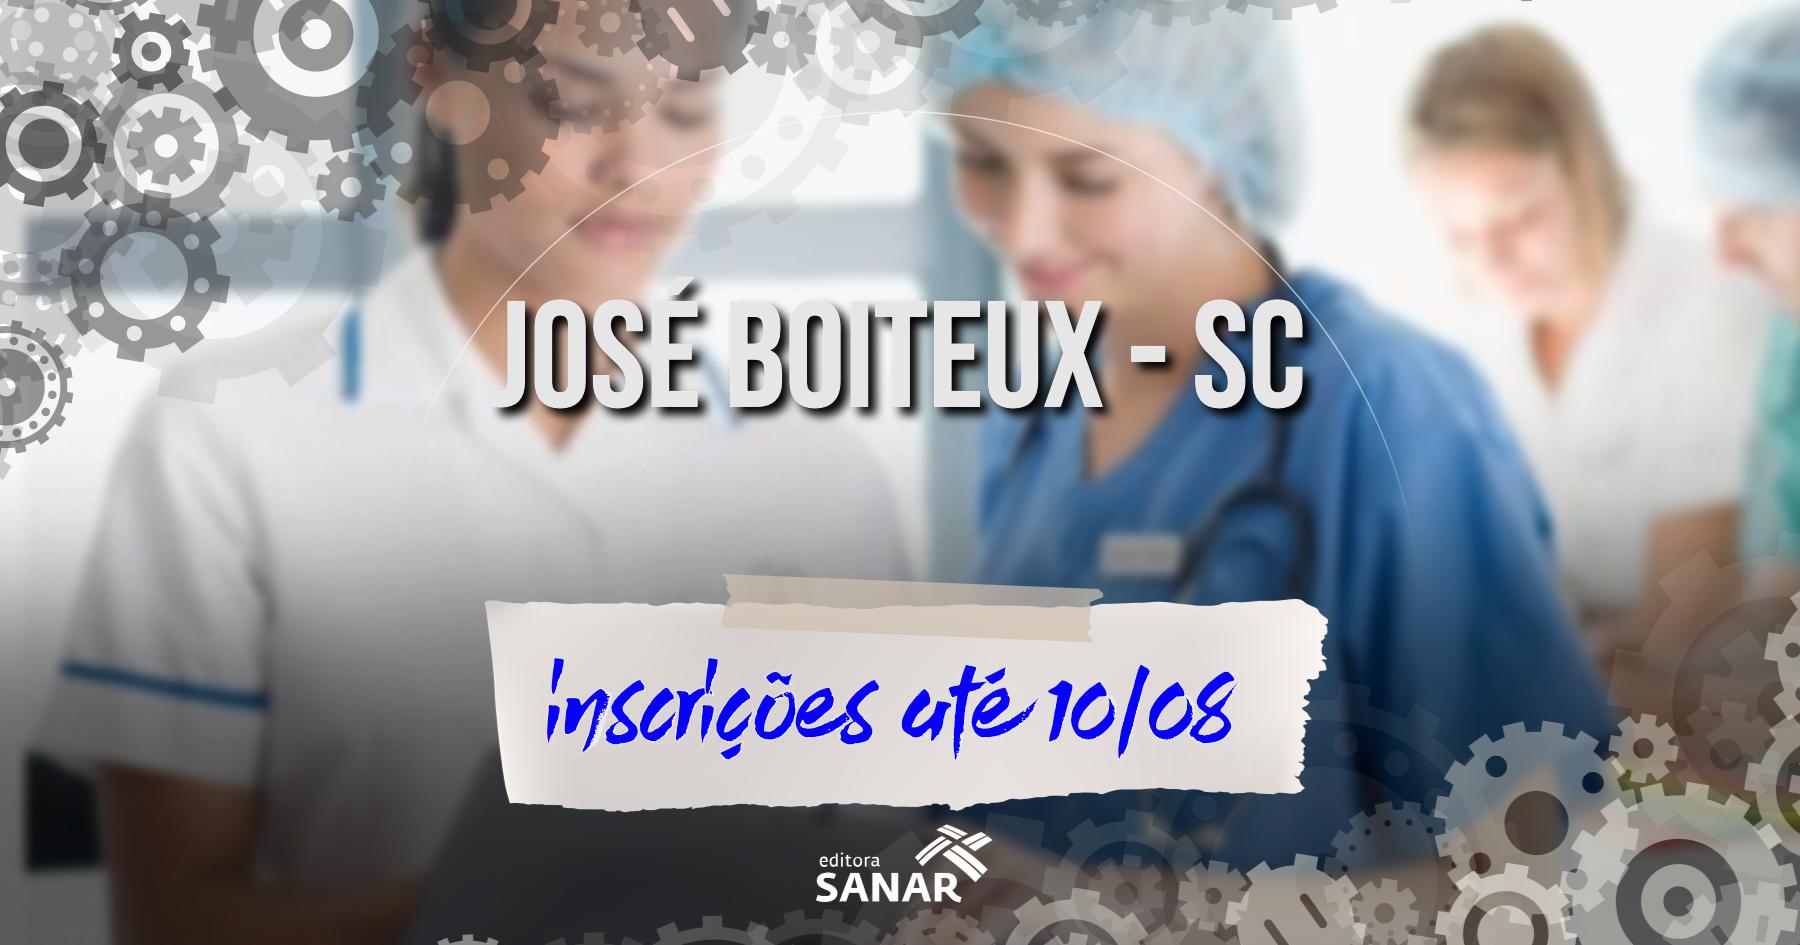 Seleção | José Boiteux (SC) tem vagas em Enfermagem